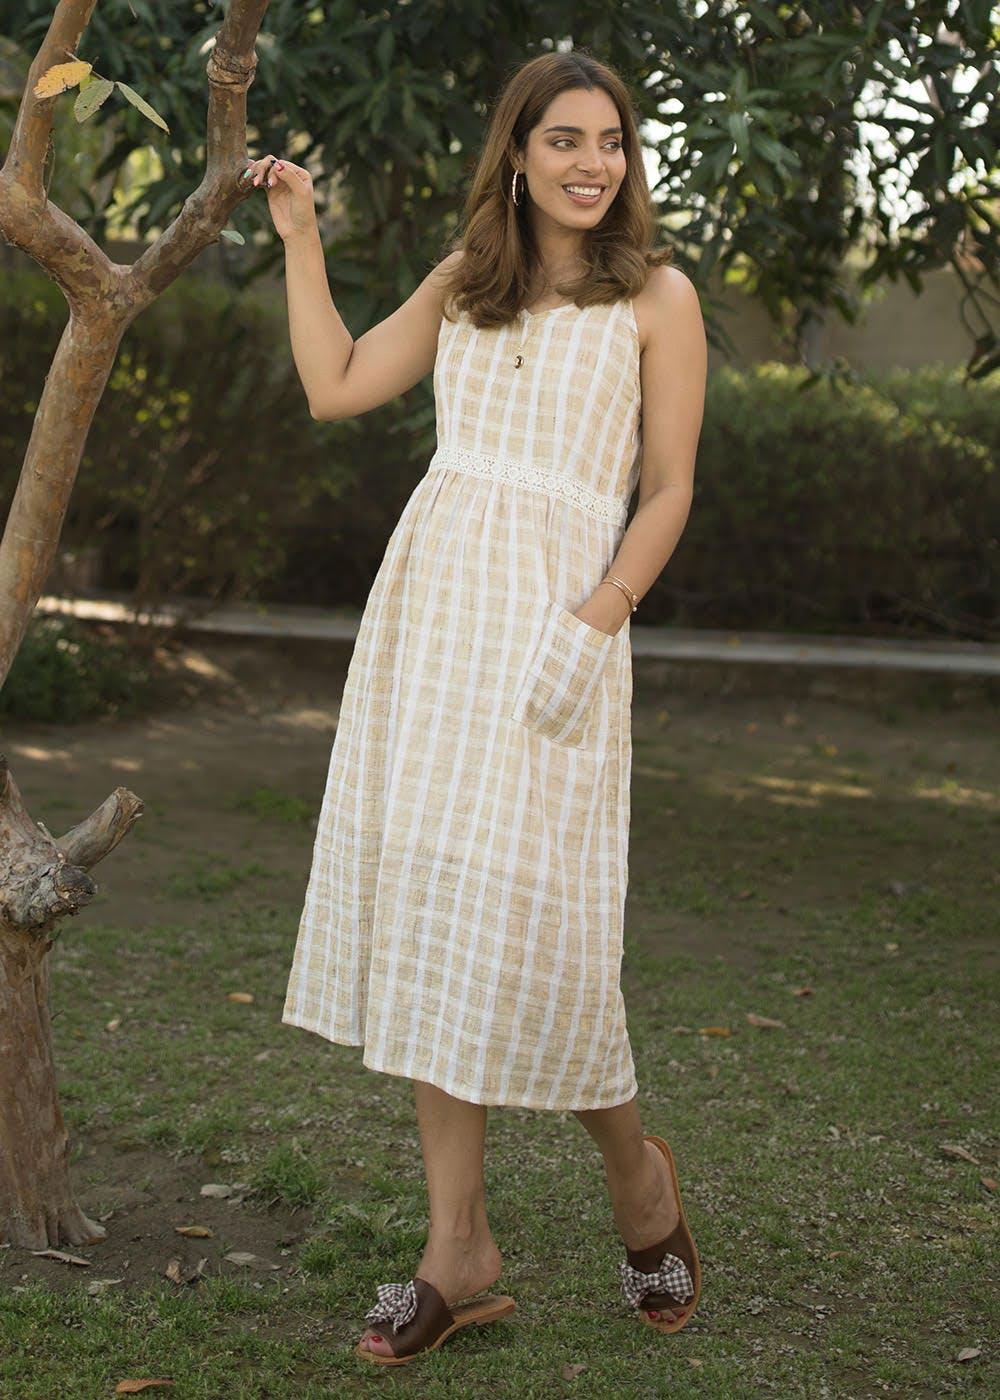 Lace Detail Checkered Jute A-Line Dress